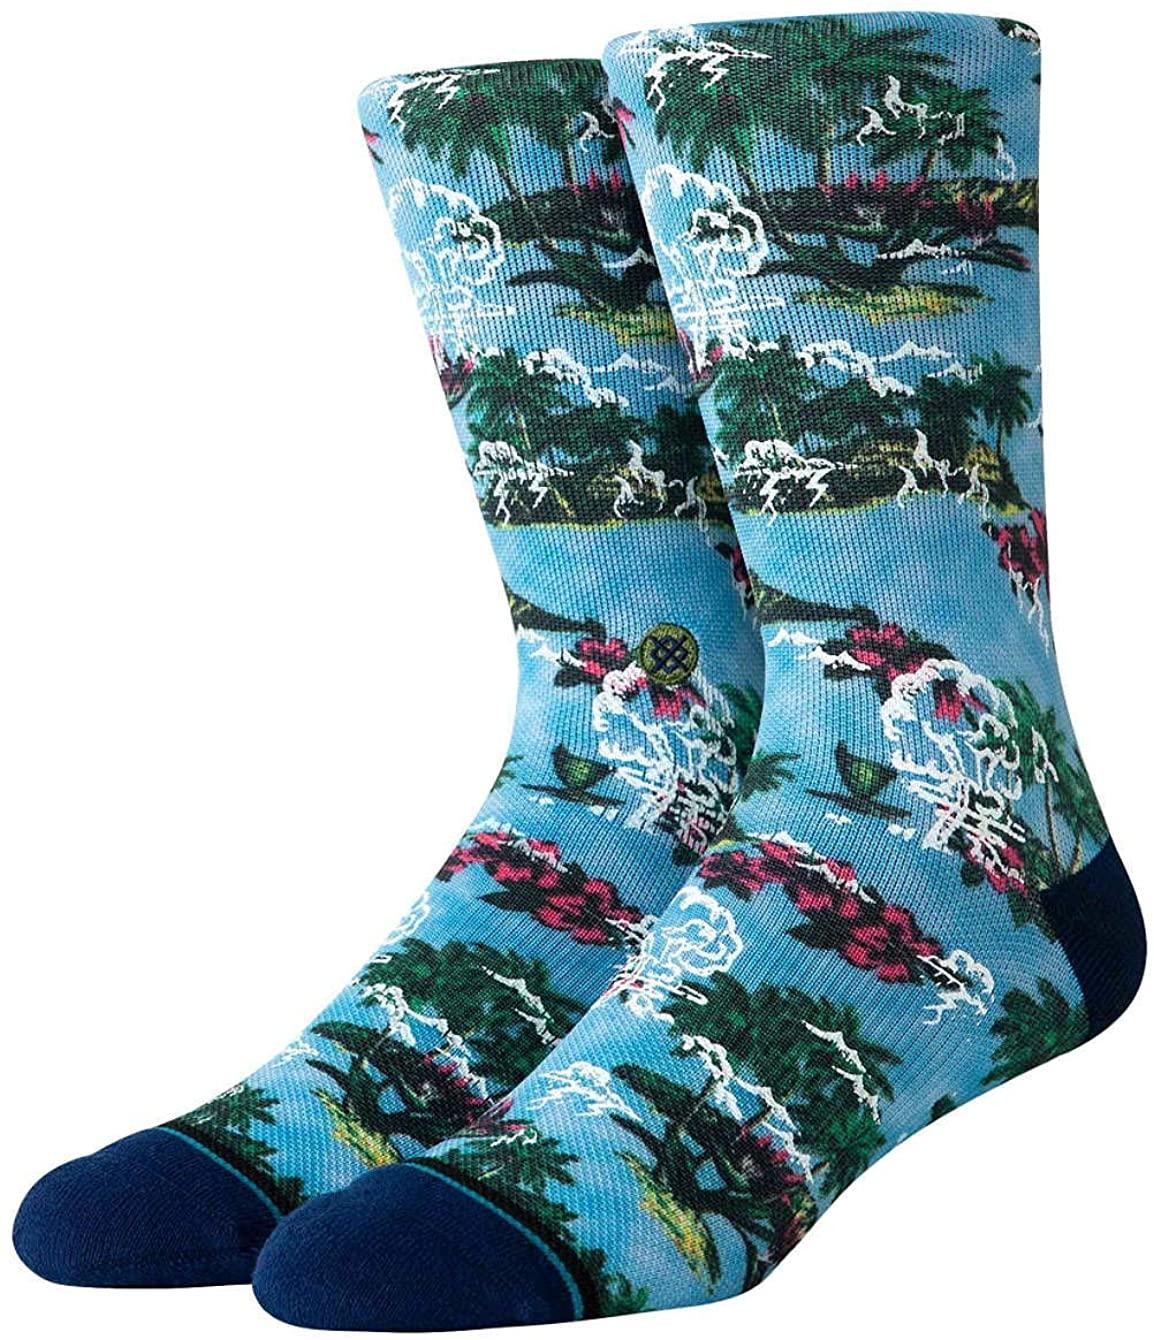 Stance Mens Atomic Wave Mens Socks - Multi Colored (Large)